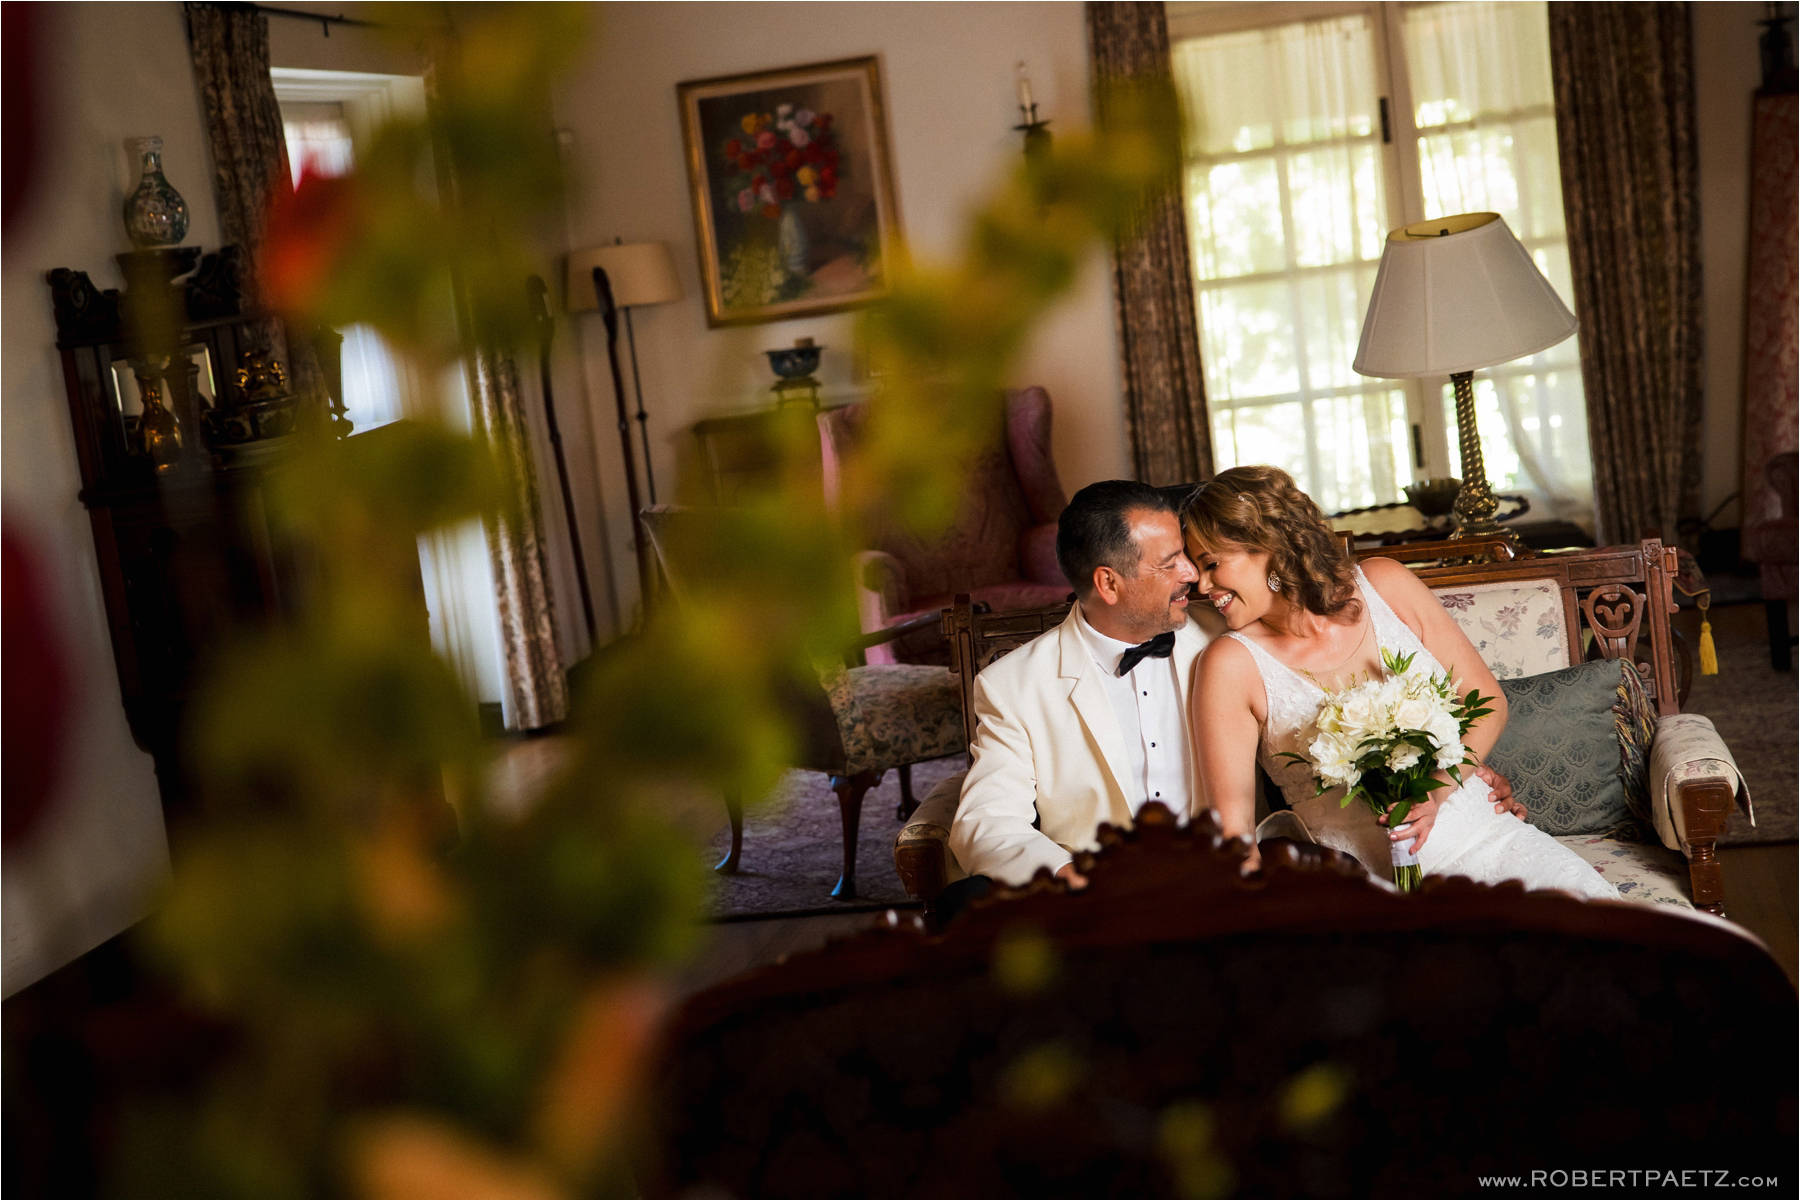 Kellogg, House, Wedding, Ceremony, Photography, Photographer, Los, Angeles, California